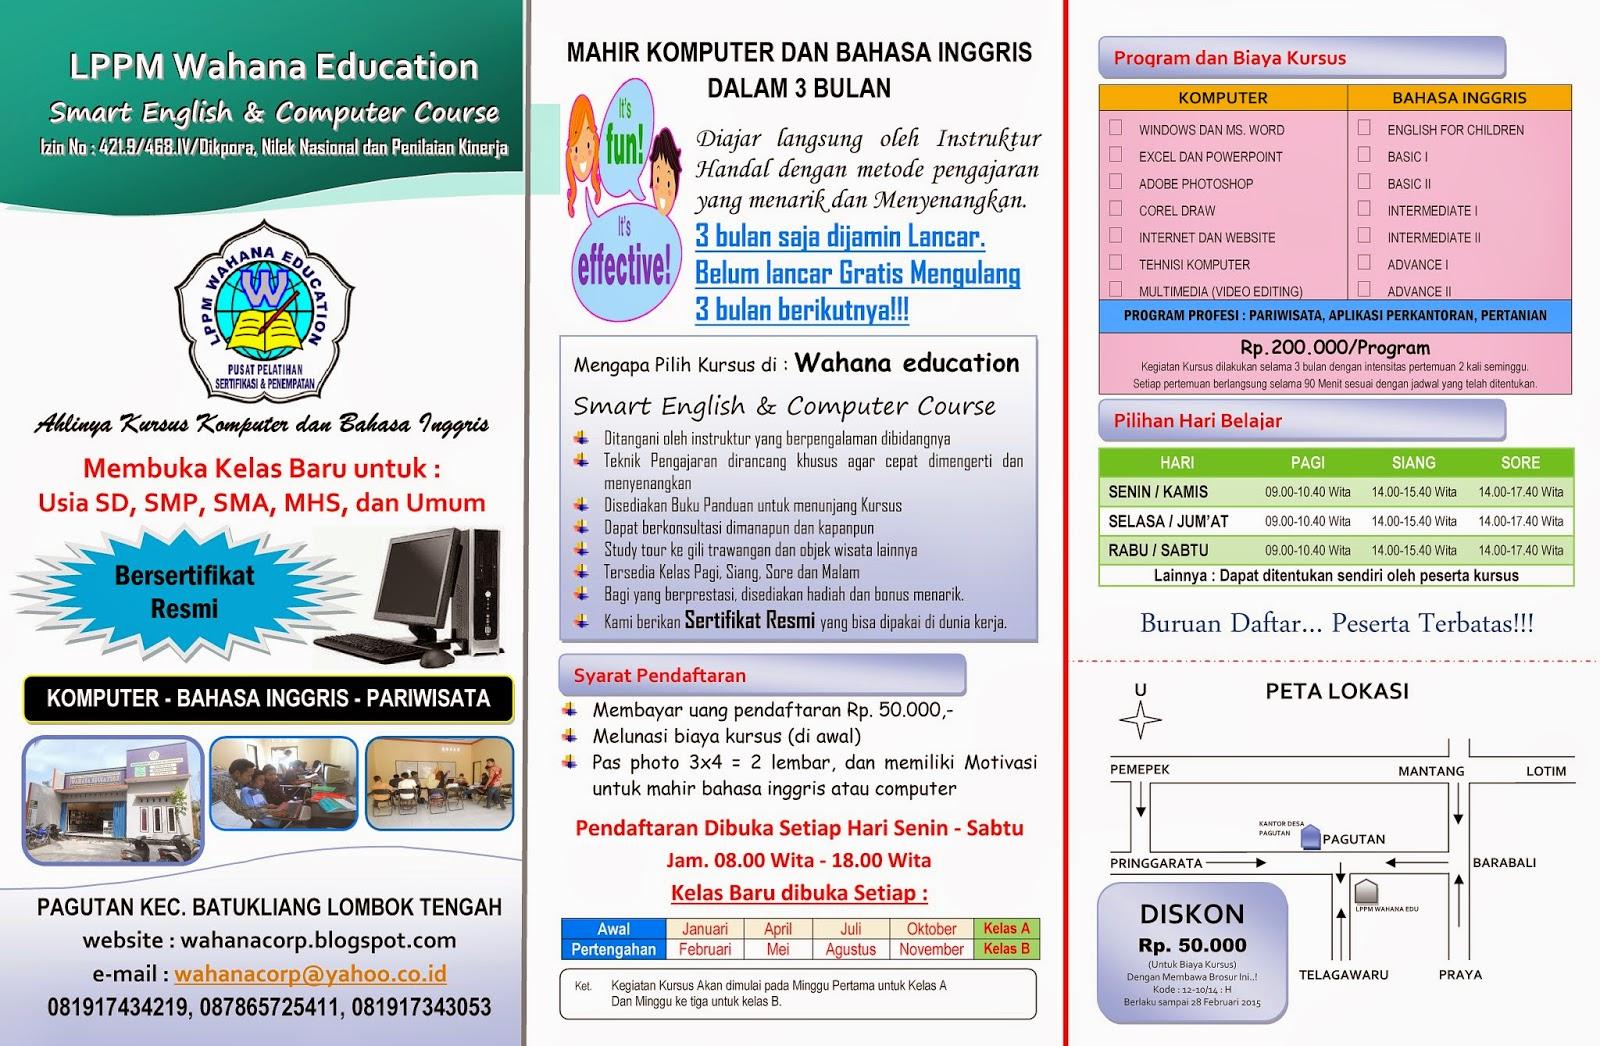 Brosur Kursus Komputer dan Bahasa Inggris Program 3 bulan